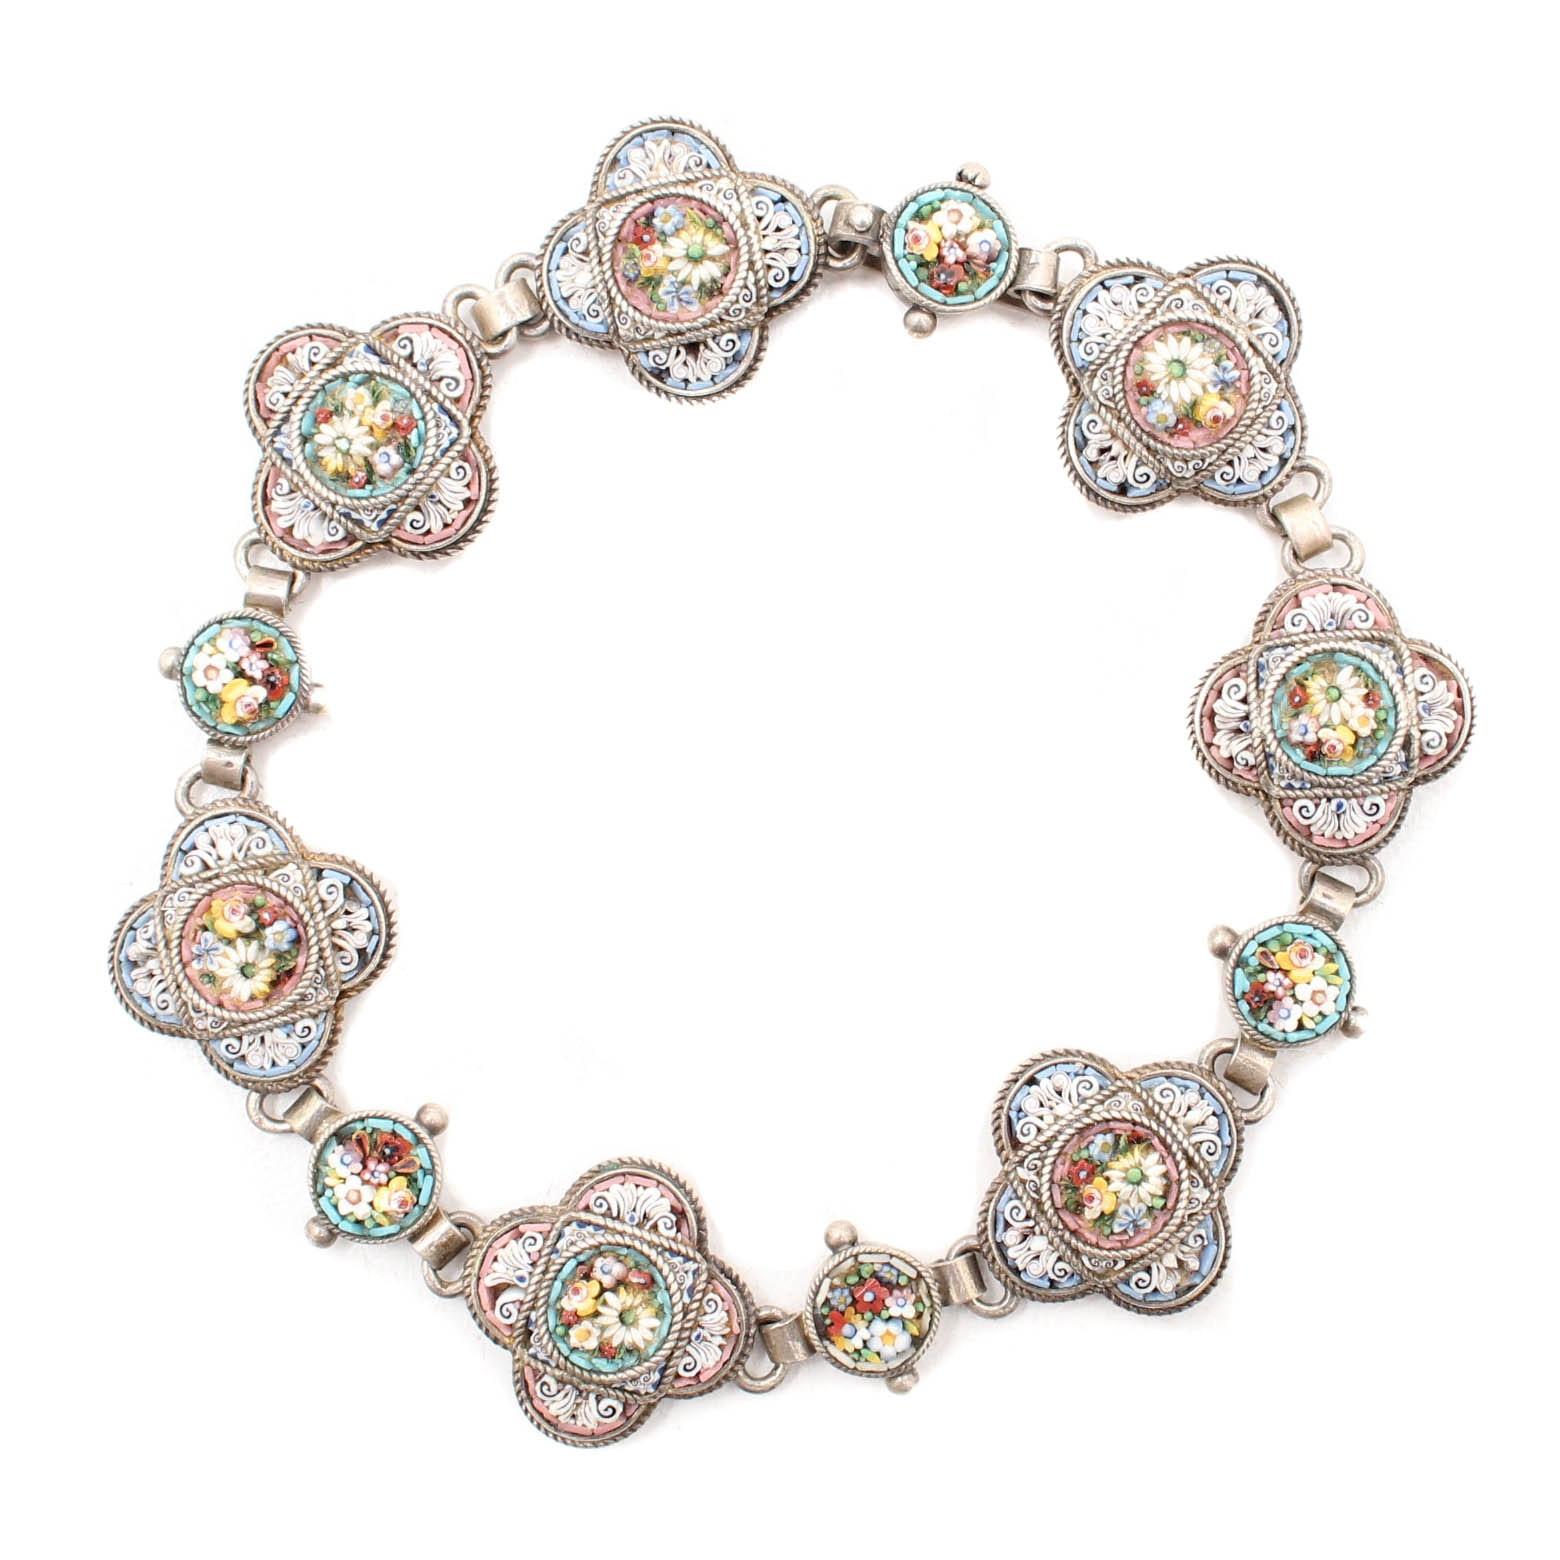 Vintage 800 Silver Micro Mosaic Bracelet